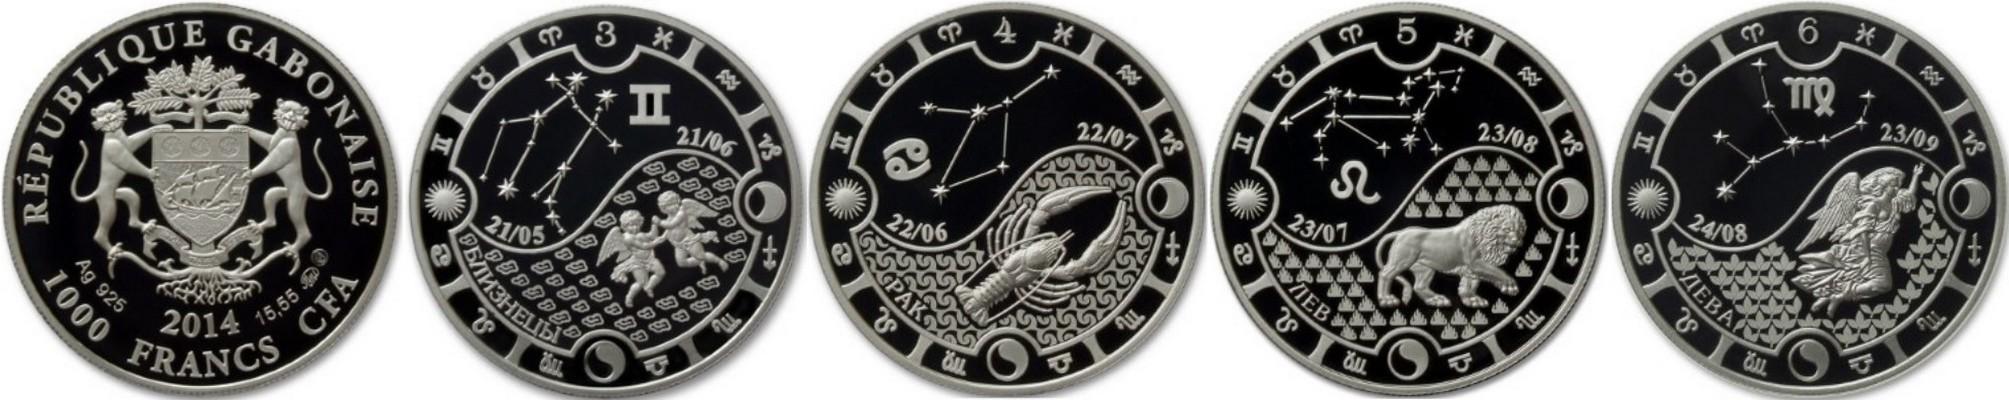 gabon 2014 zodiaque demi oz 1-4.jpg